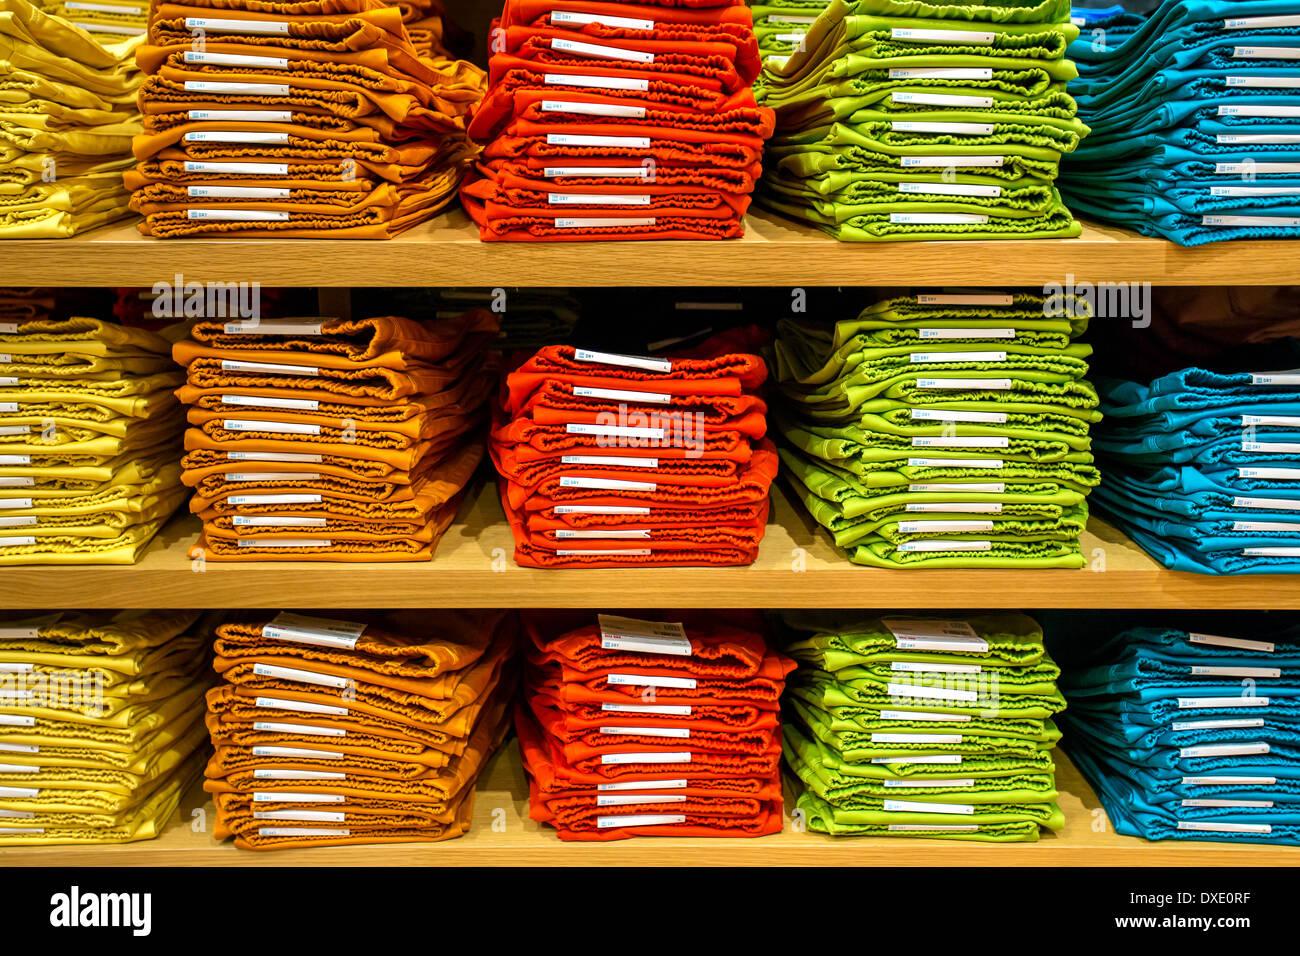 neat stacks of folded clothing on the shop shelves stock photo rh alamy com neat shelves neat shelves